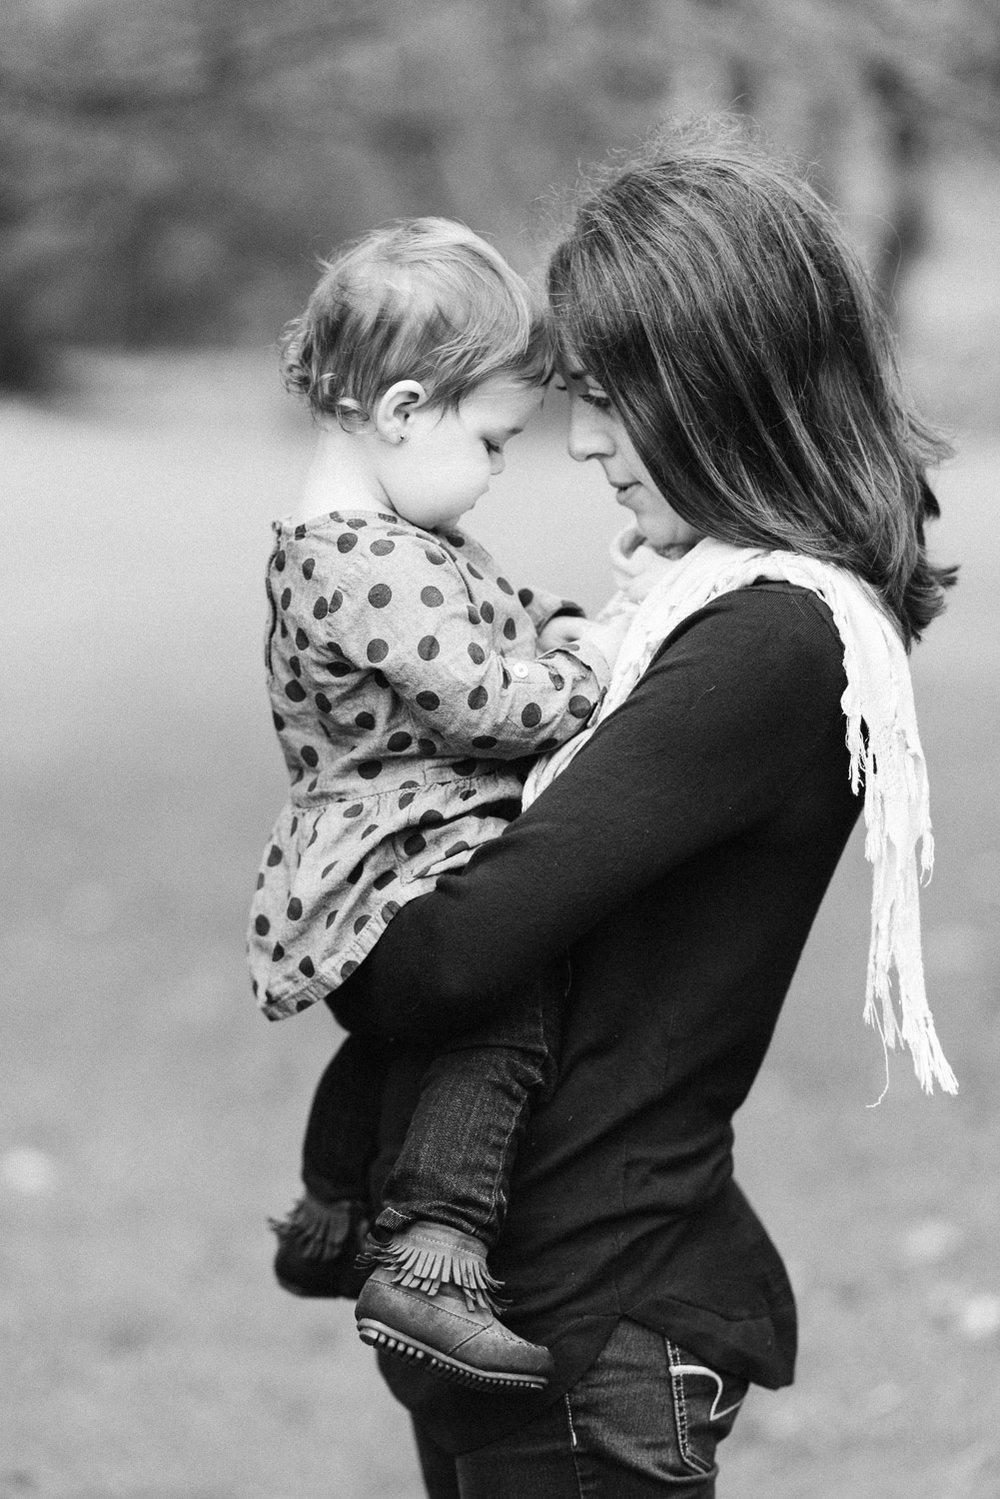 mother-daughter-sweet-head-to-head.jpg